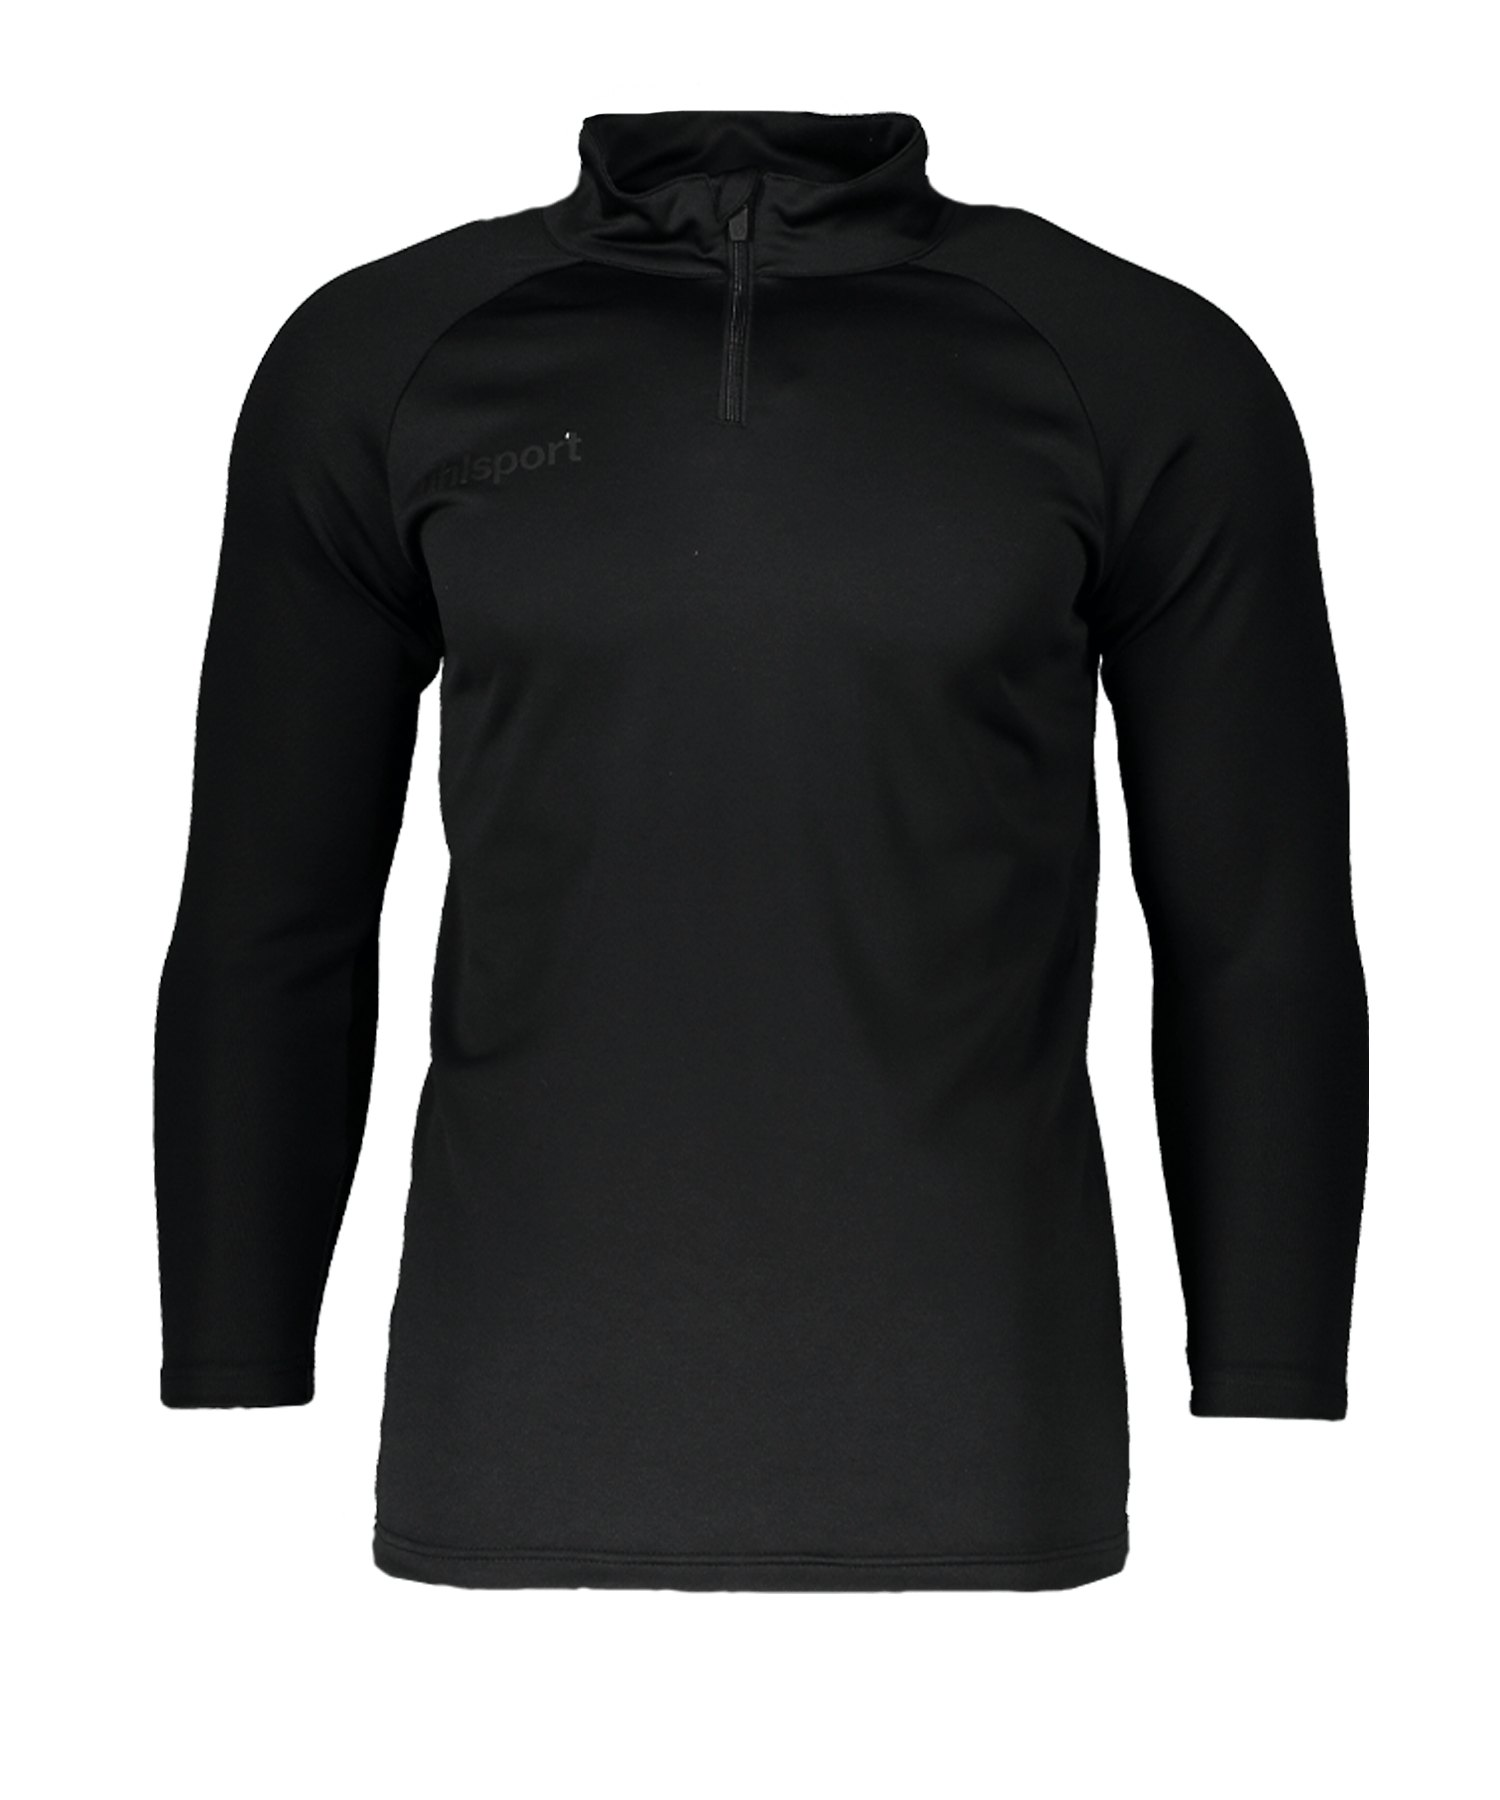 Uhlsport Goalkeeper 1/4 Ziptop Schwarz F01 - schwarz